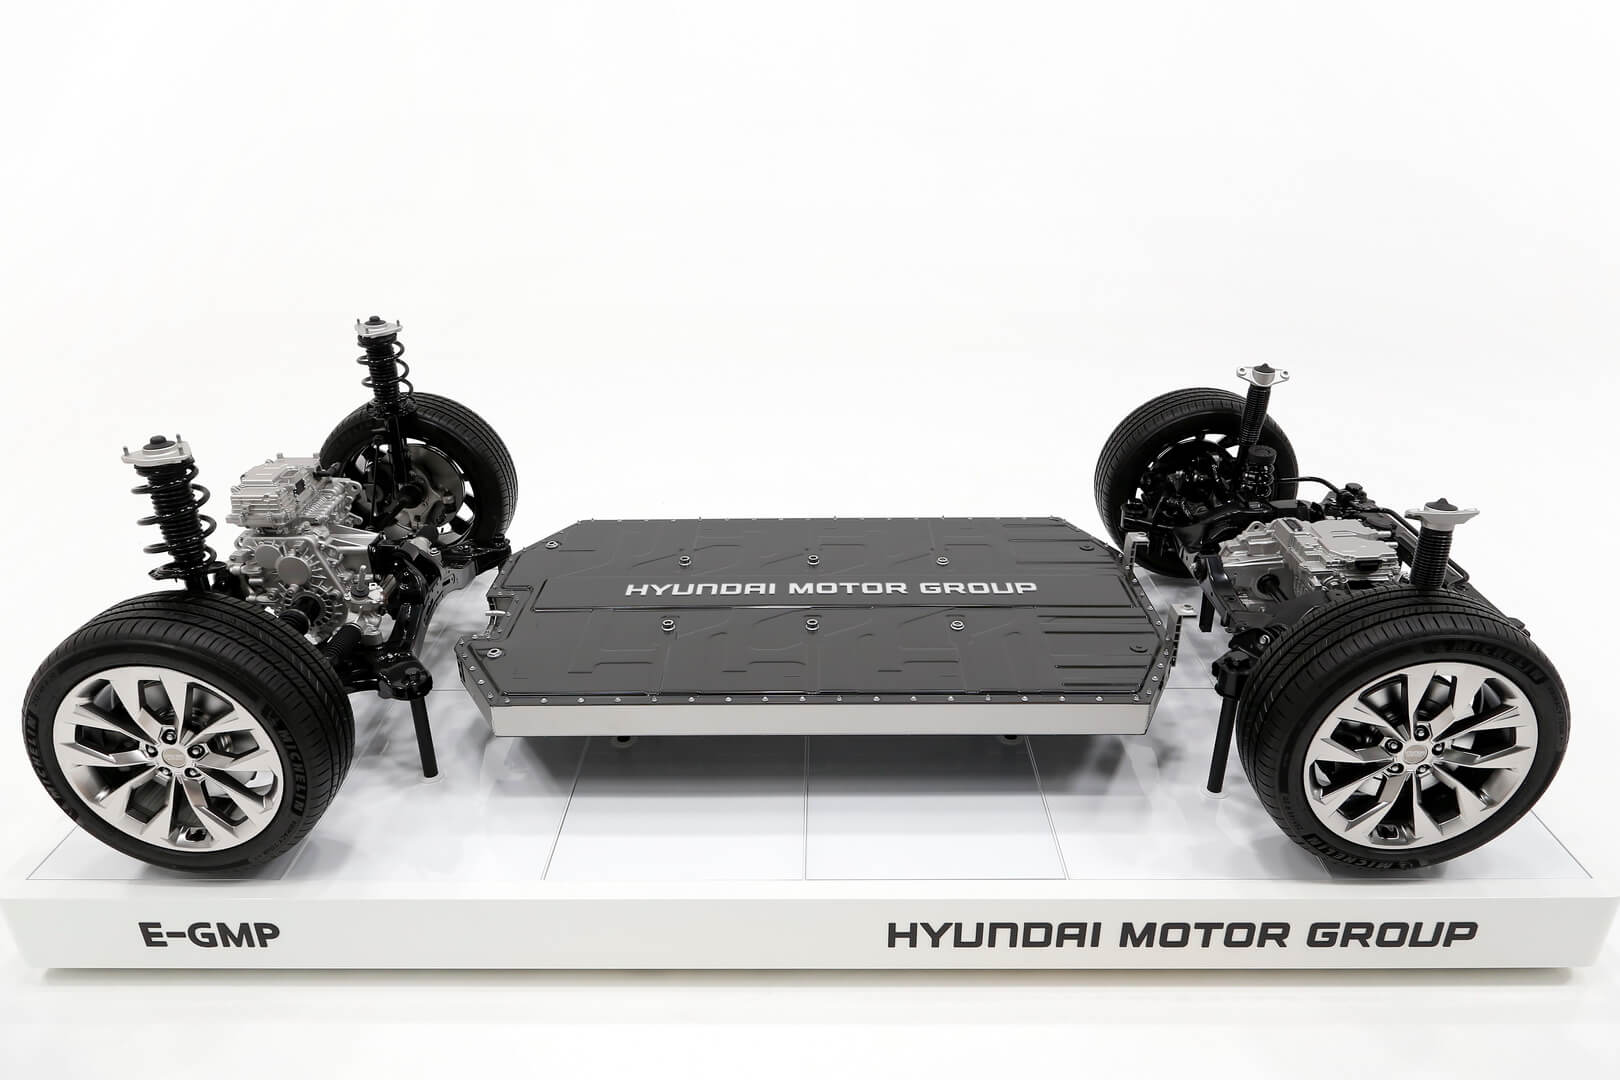 Hyundai представляет модульную платформу для электромобилей E-GMP